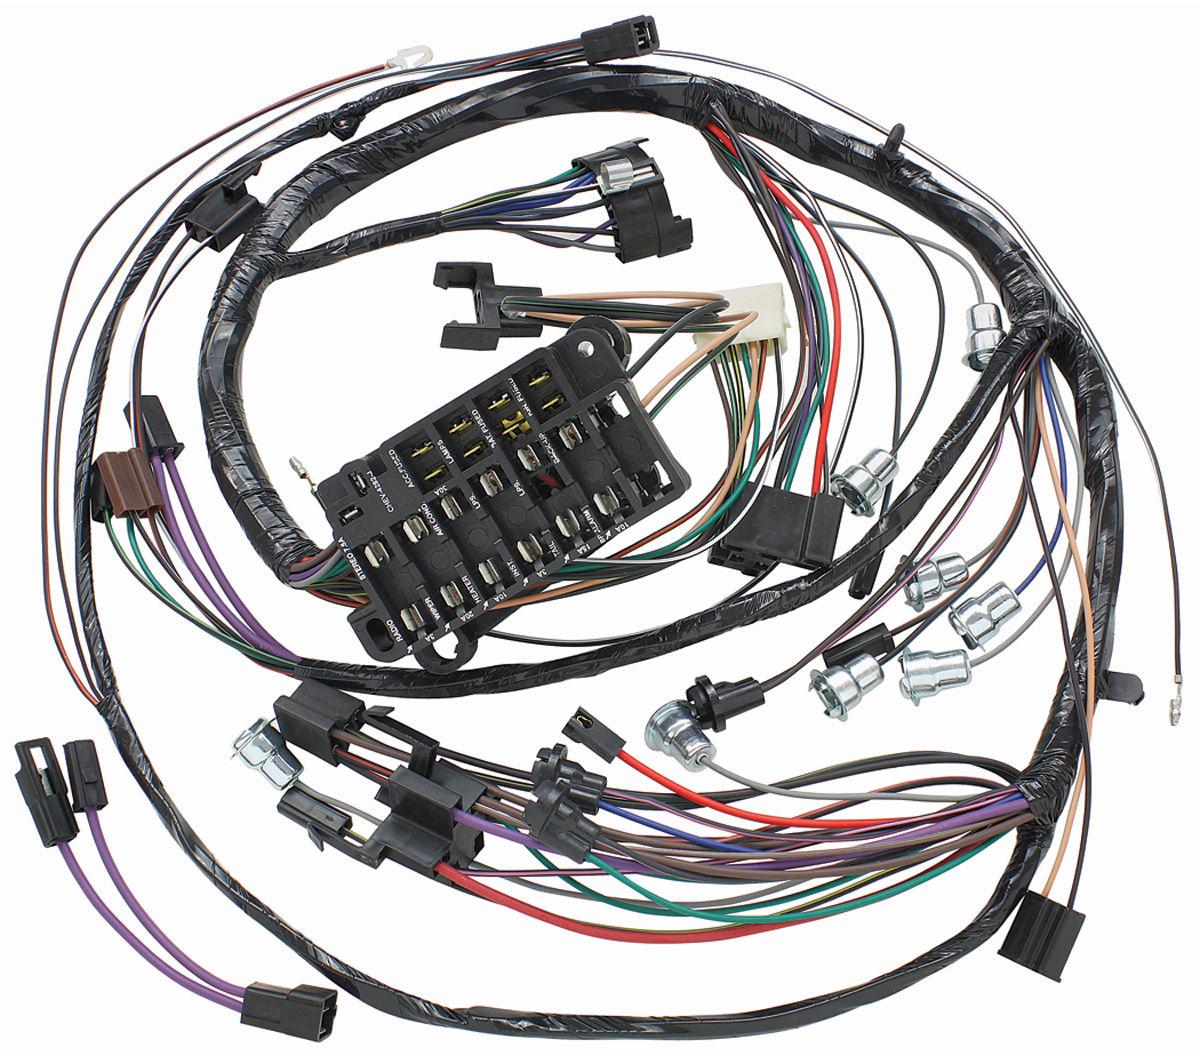 medium resolution of 1971 el camino dash instrument panel harness all sweep gauge type